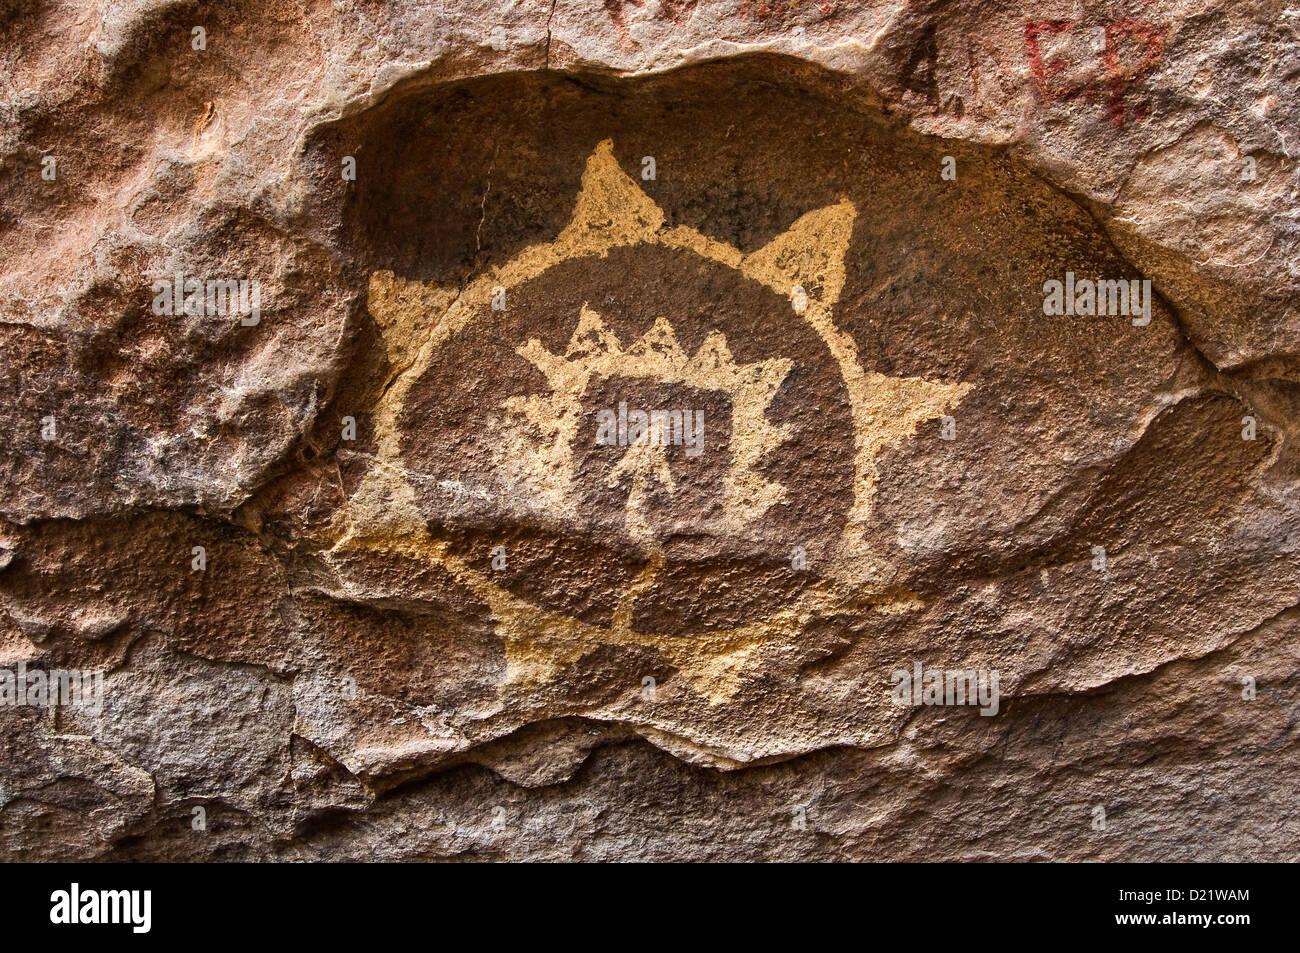 Mescalero Apache pictograph, Hueco Tanks State Park and Historic Site, near El Paso, Texas, USA - Stock Image